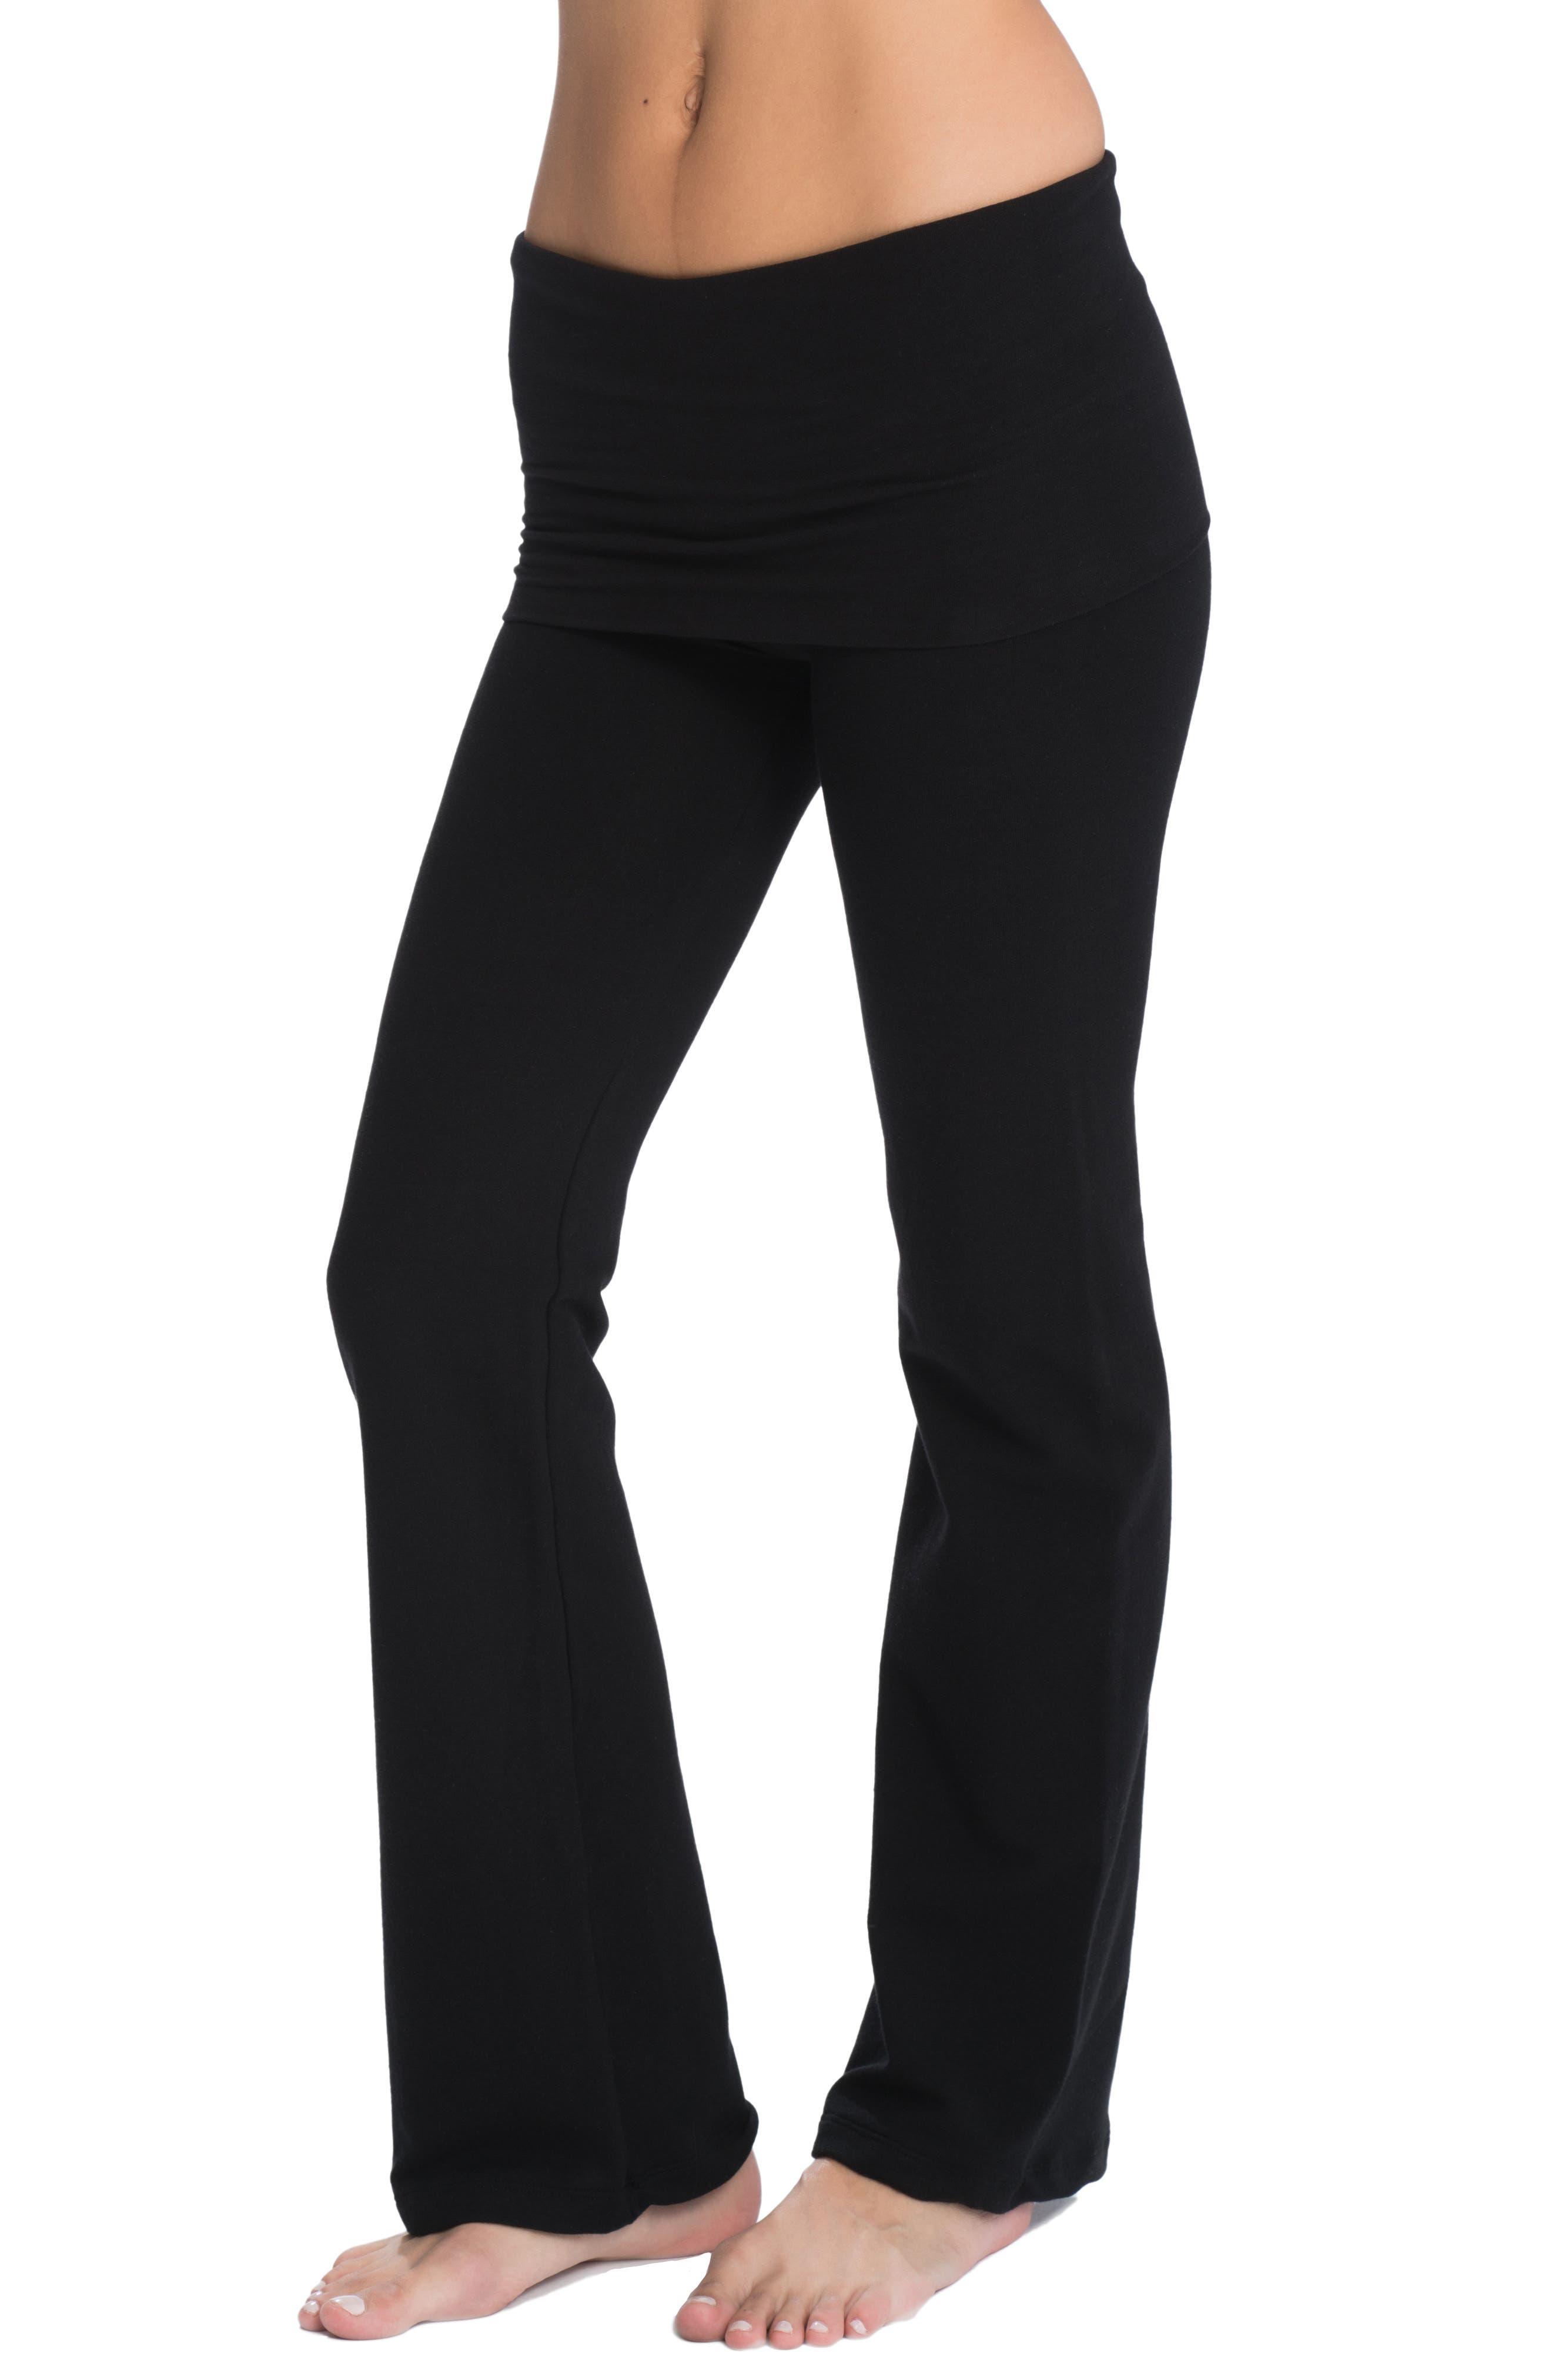 Cozy Wide Leg Foldover Maternity Pants,                             Alternate thumbnail 2, color,                             005